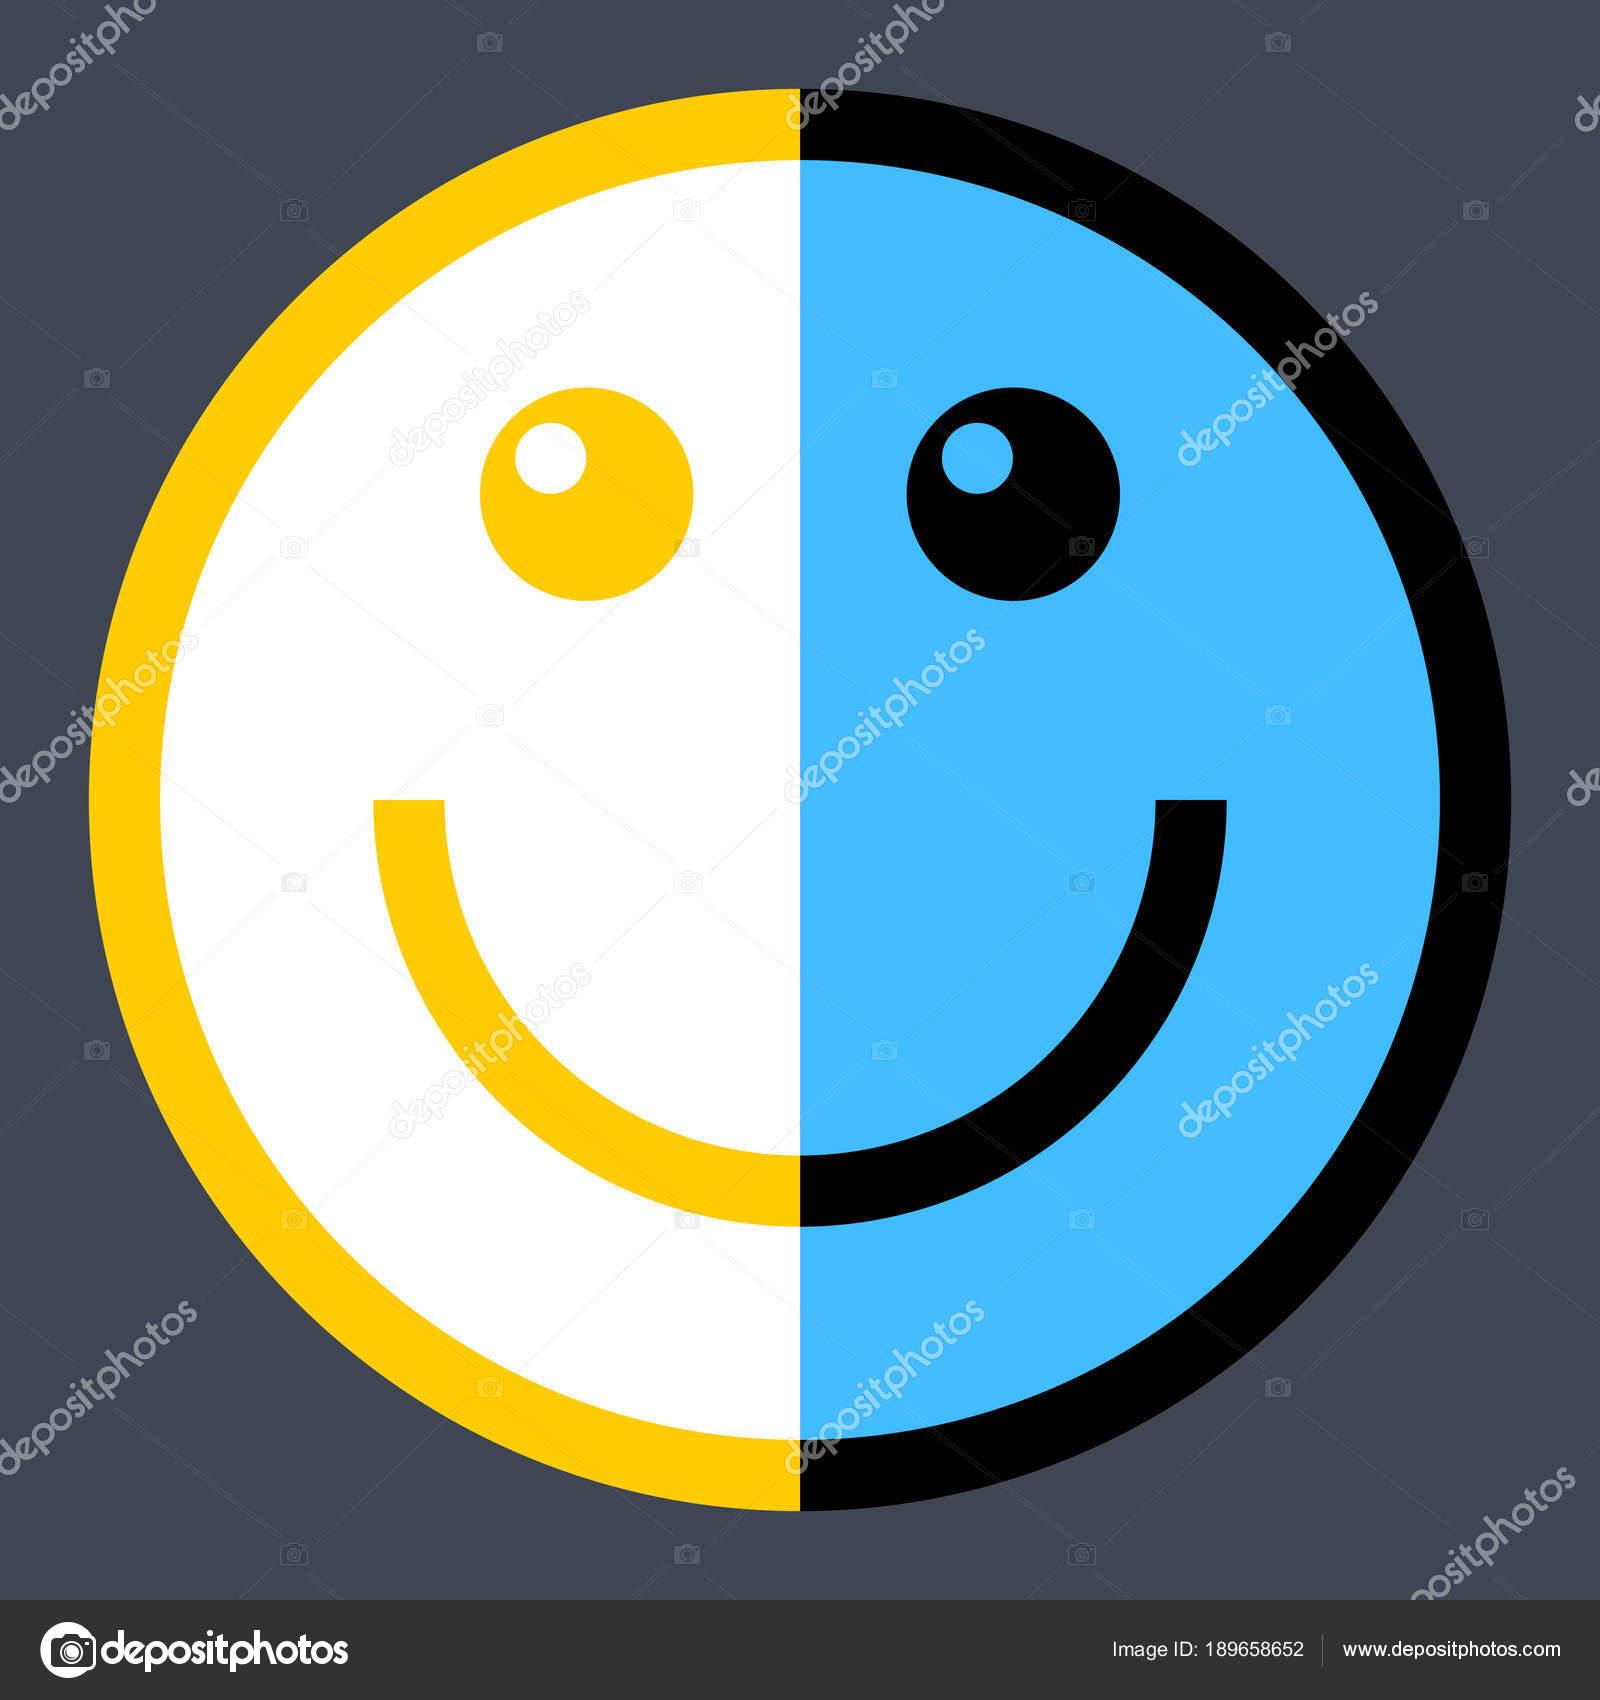 smilies oder smileys